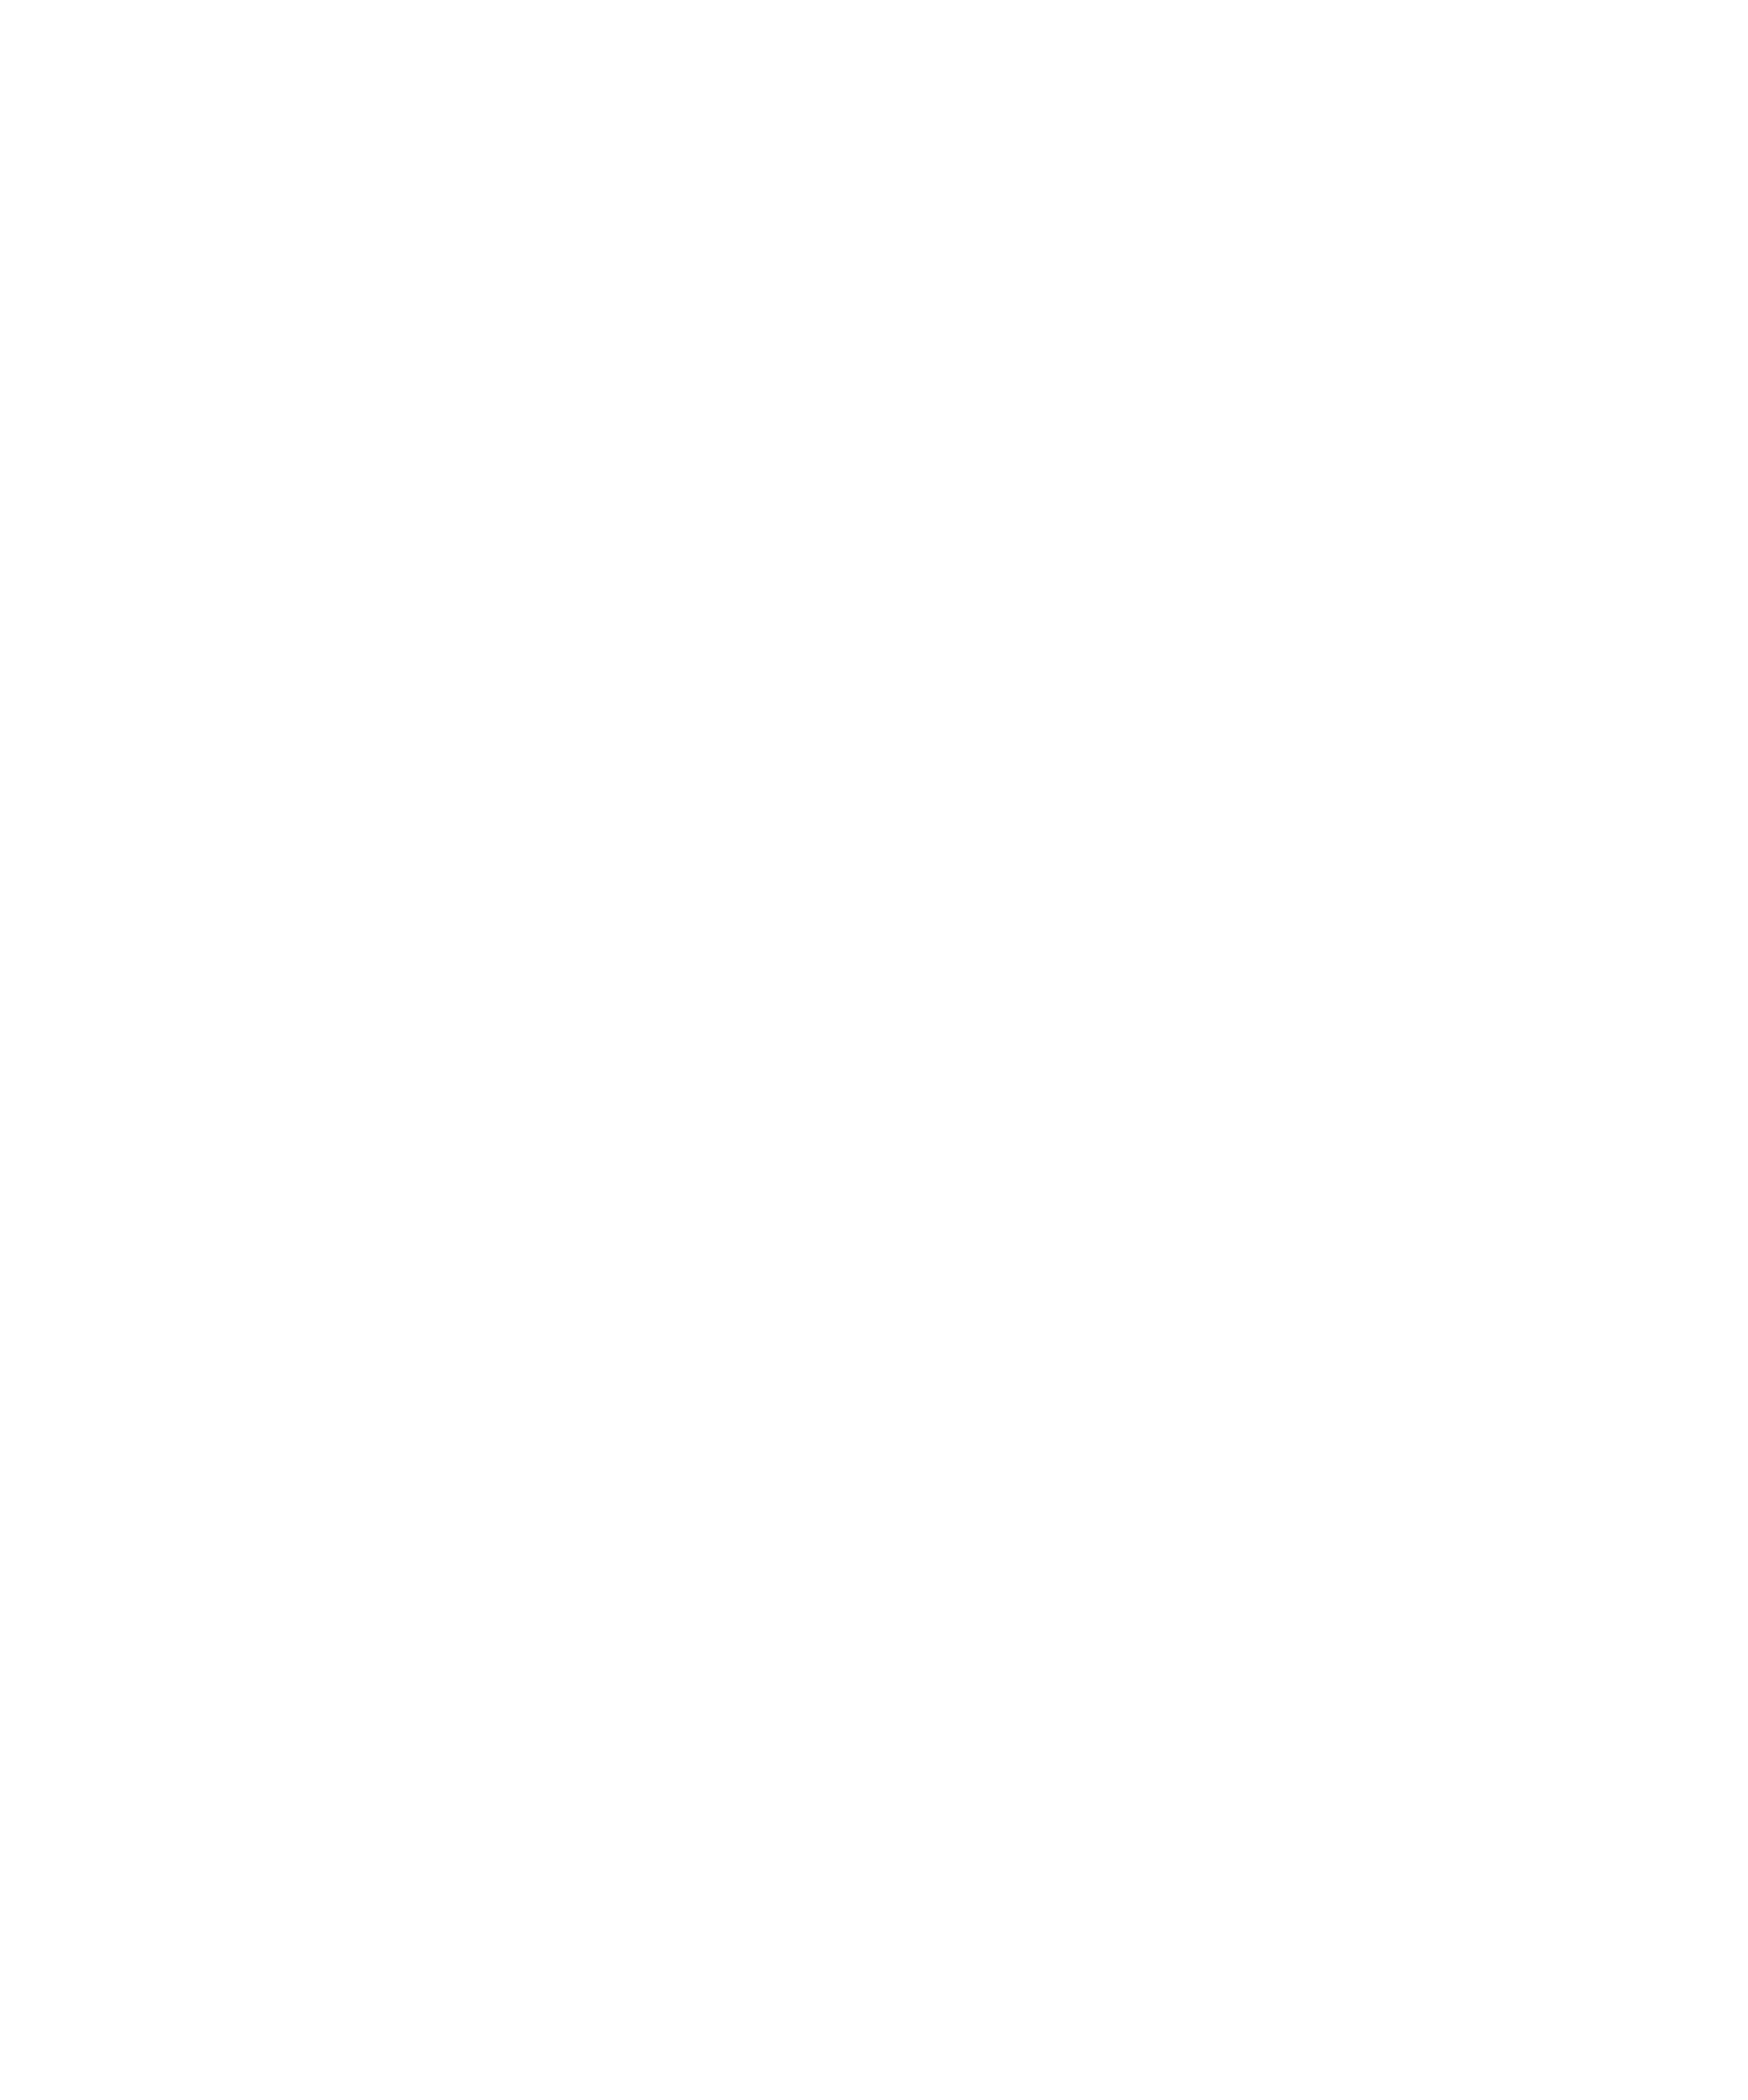 Design a sleek logo for a light-focused technology brand